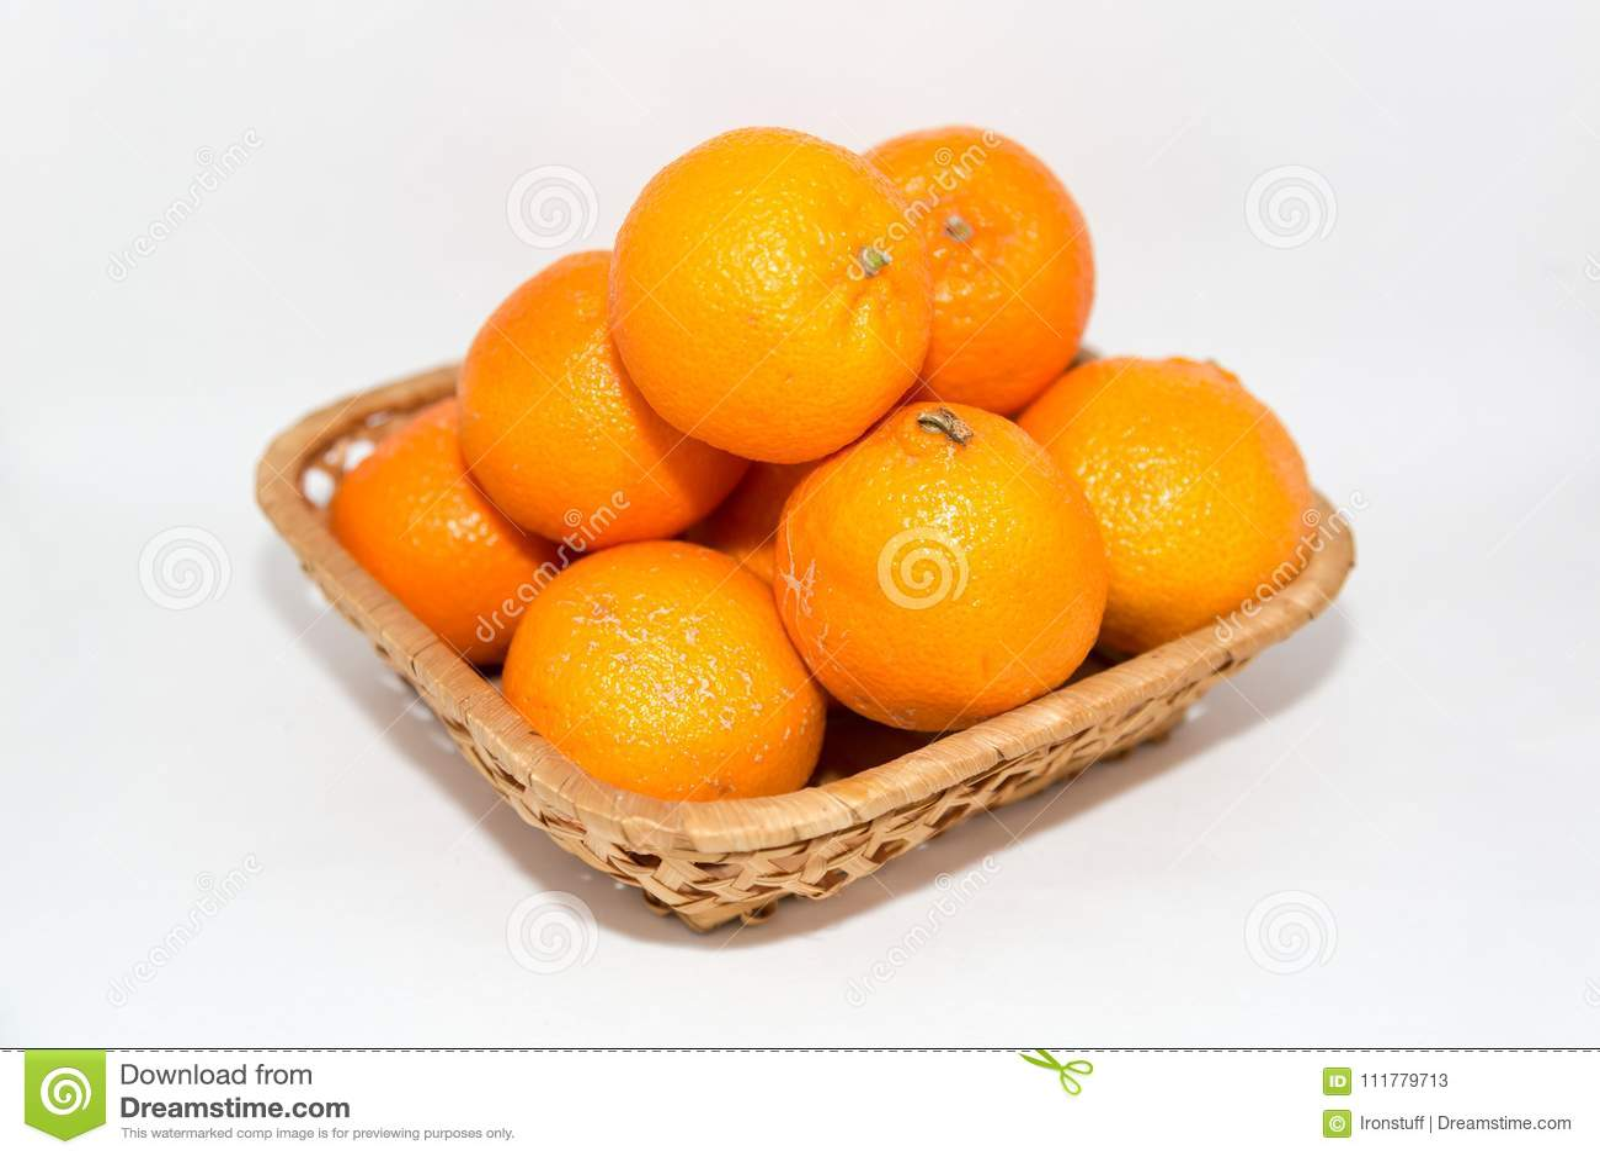 Orange tangerines in a basket